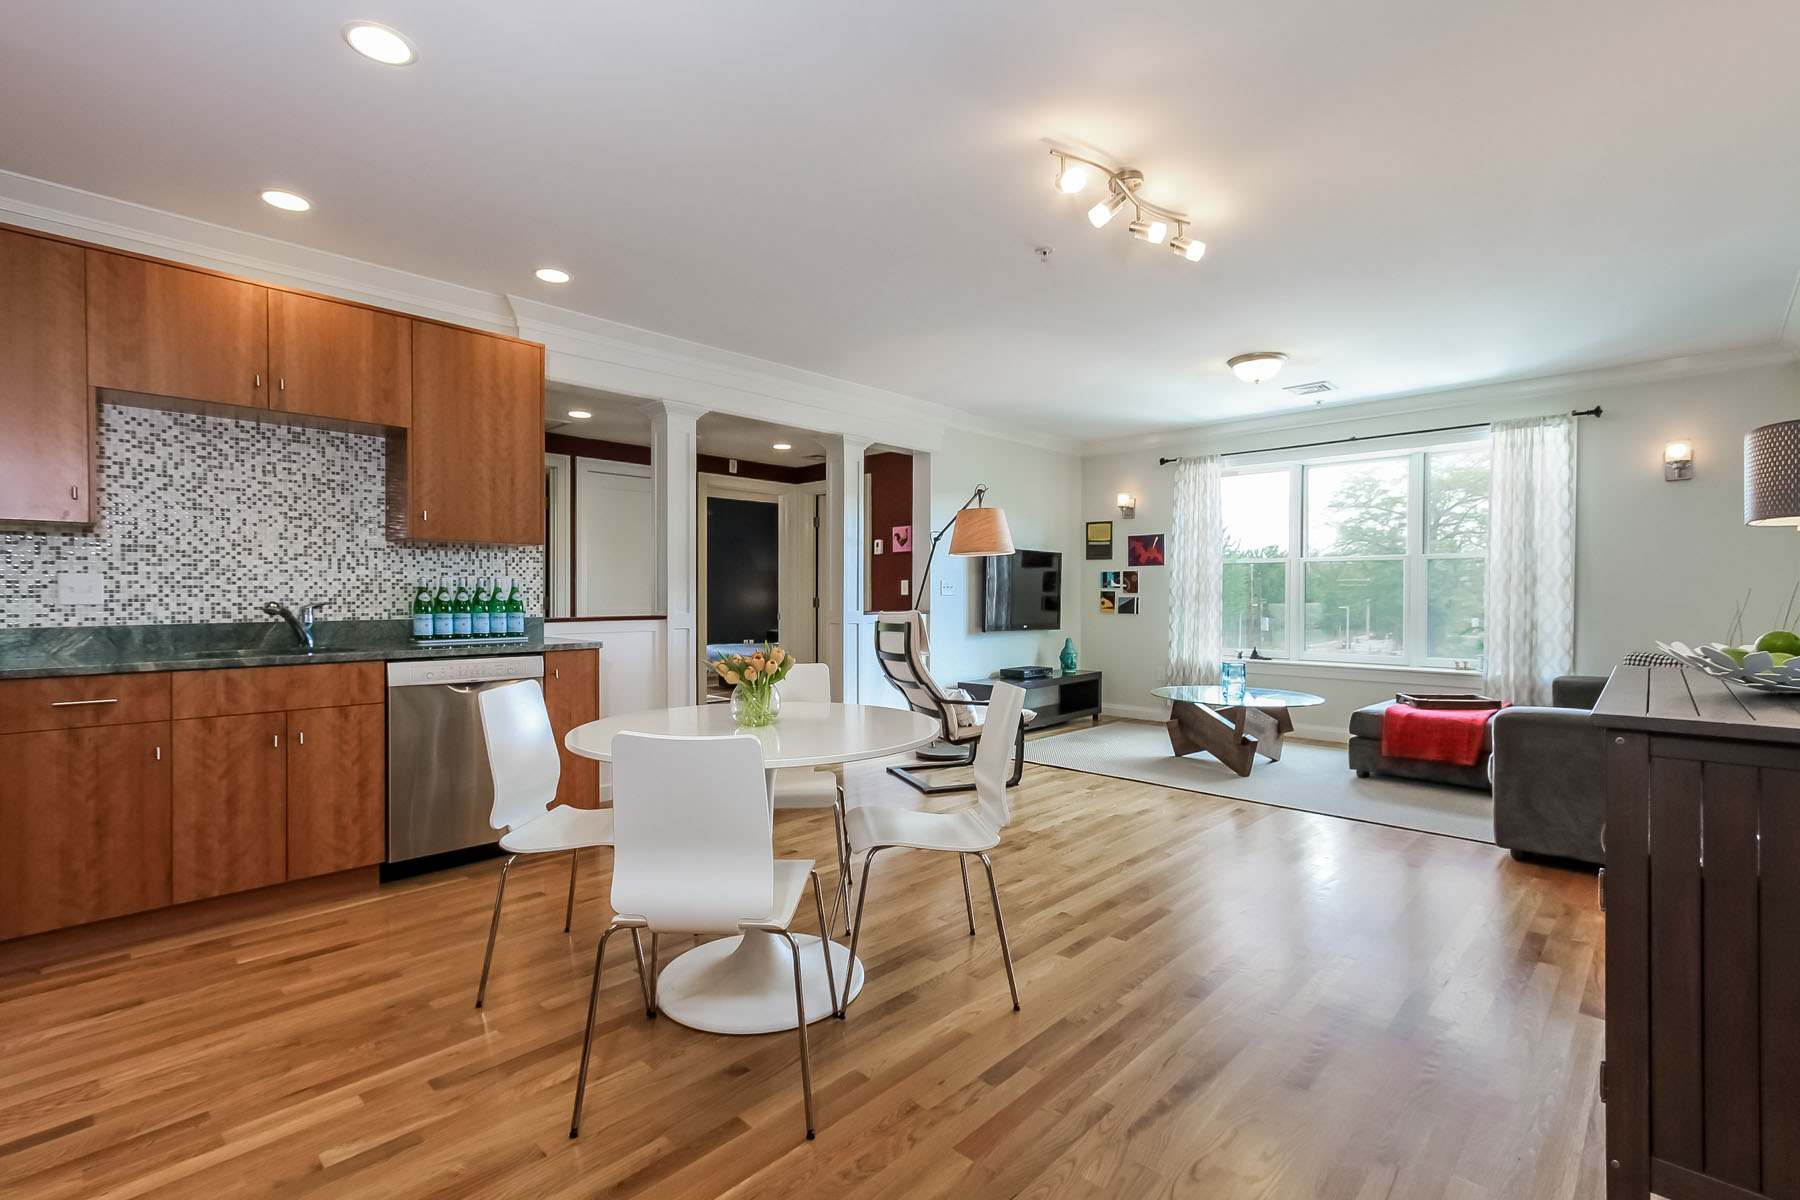 Condominium for Sale at Bartlett Square 156 Green Street #201 Jamaica Plain, Boston, Massachusetts 02130 United States